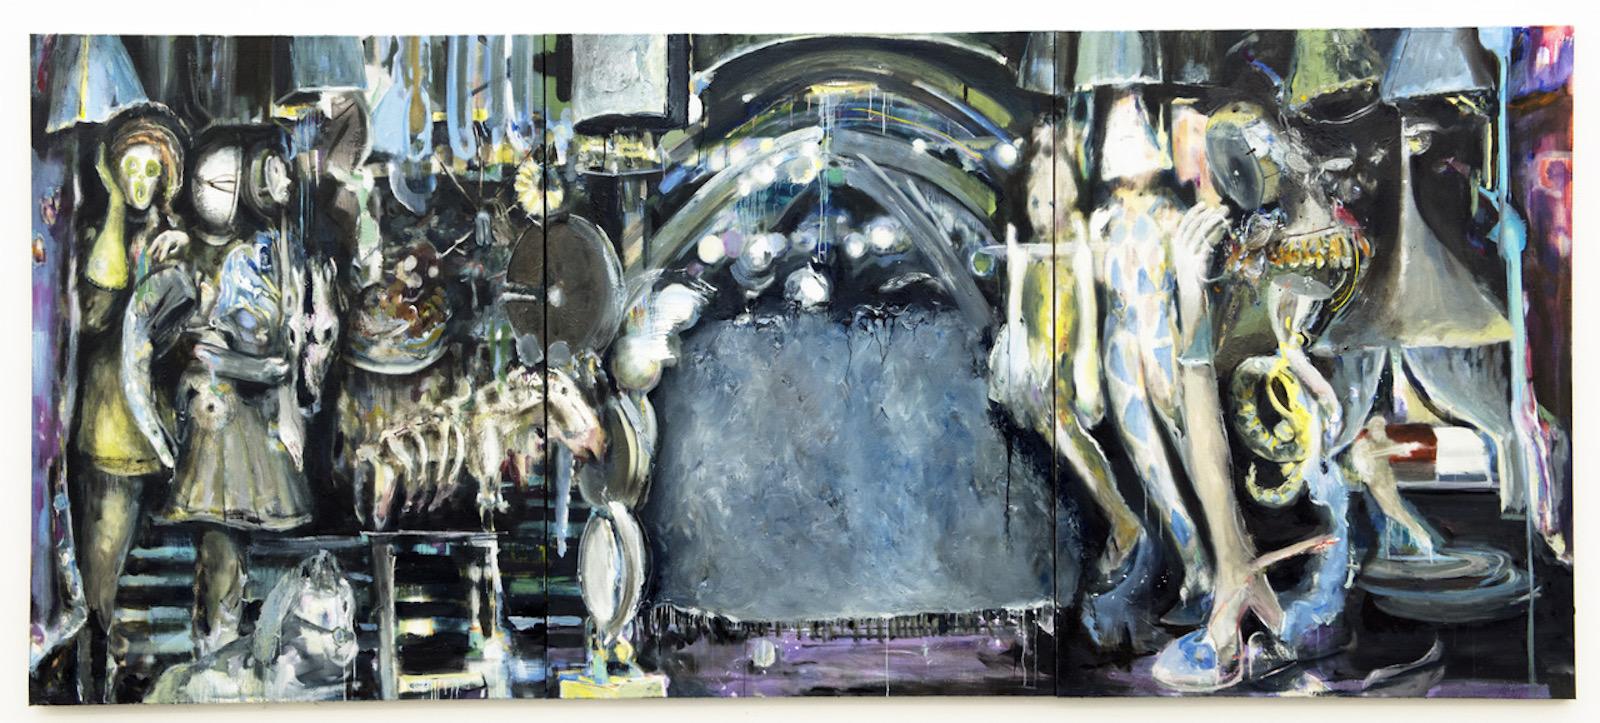 "Valérie Favre ""L'ordre de la nuit"", 2016-17 170 x 390 cm Oil on canvas Courtesy Galerie Barbara Thumm © Valérie Favre & VG Bild-Kunst"